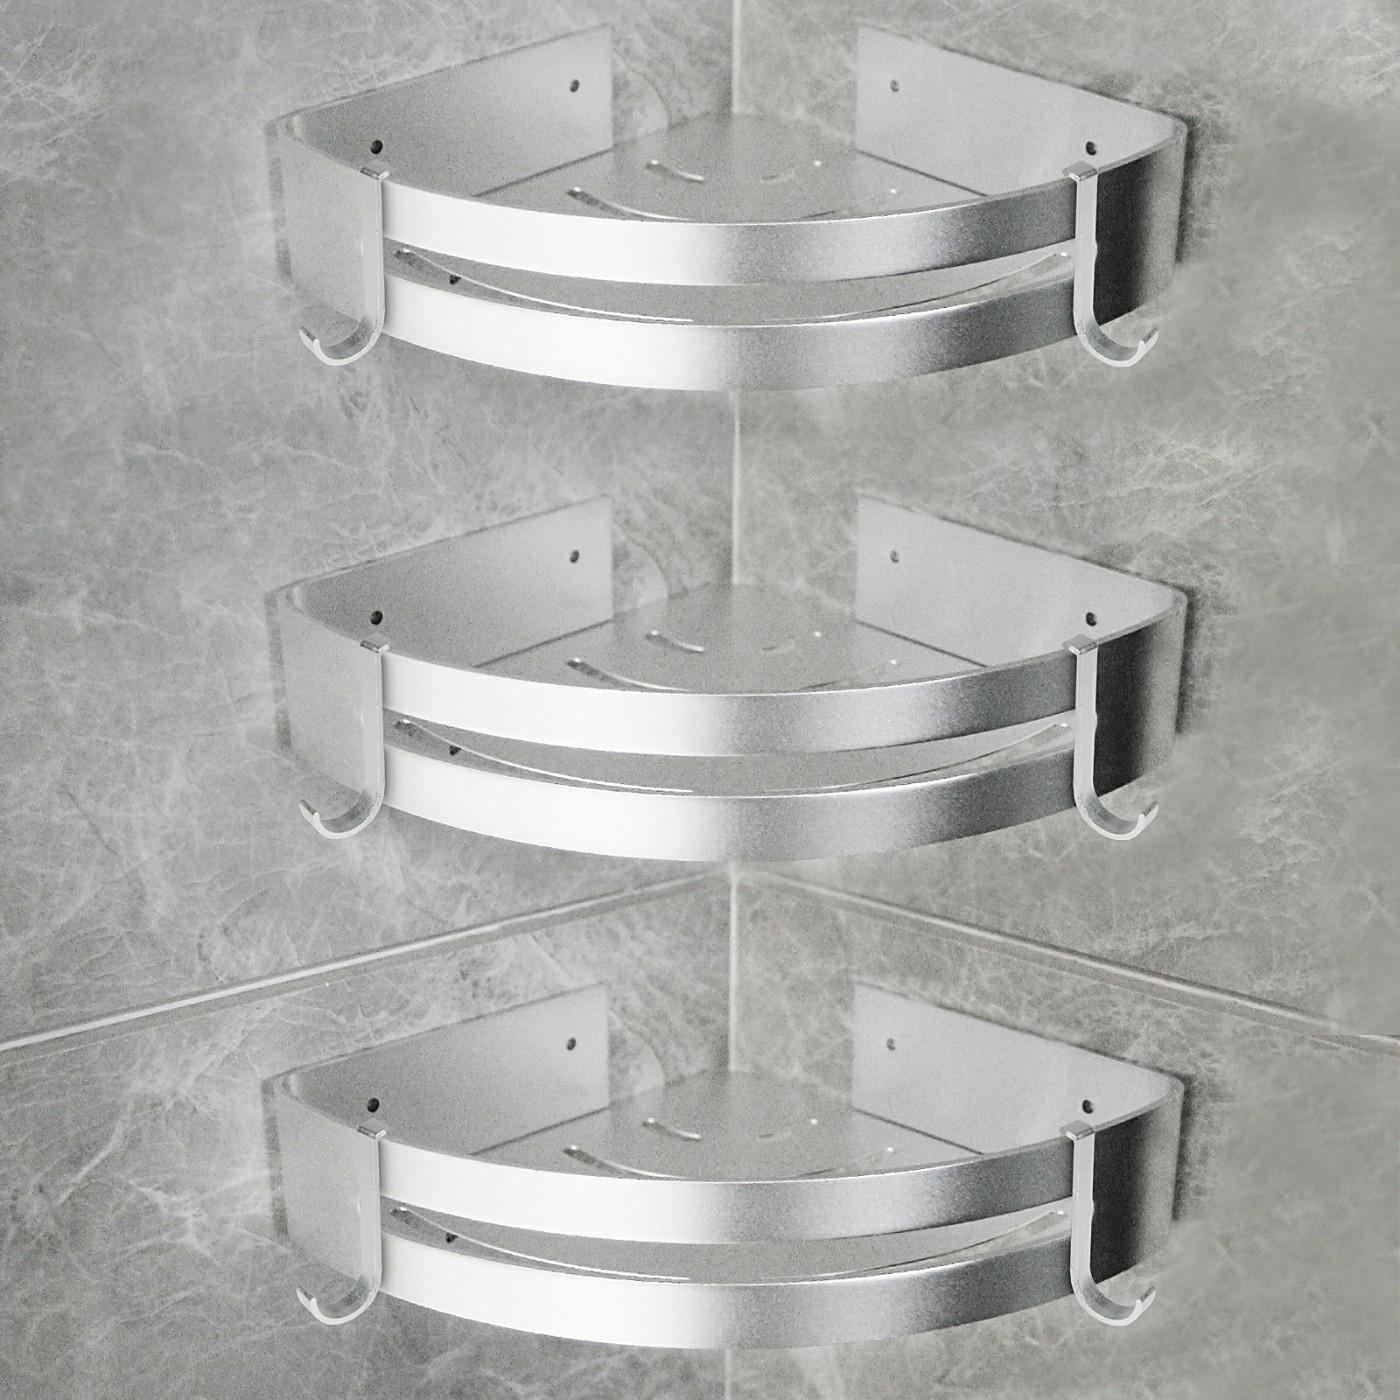 20 Stücke Duschregal aus Aluminium in silber, Badezimmer Eckregal ...